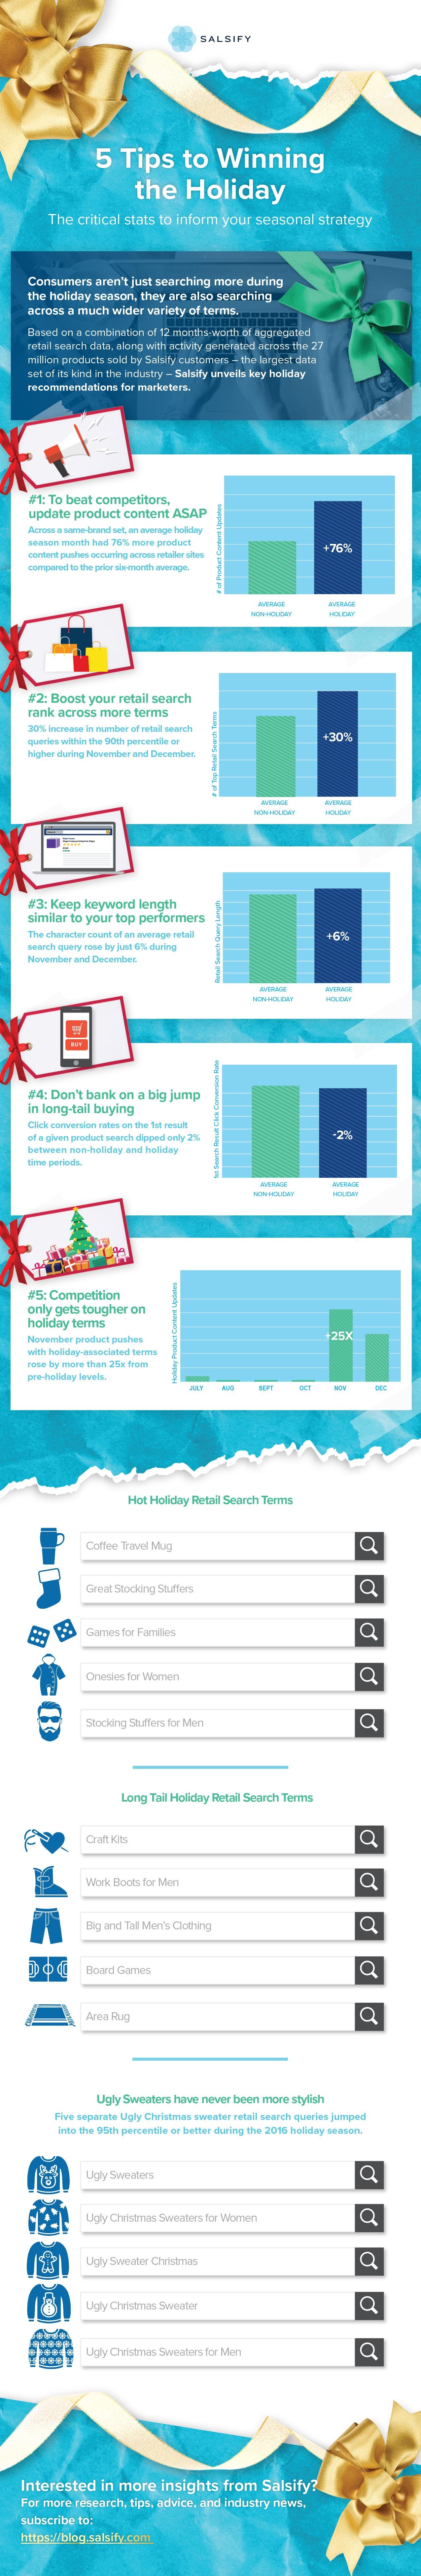 Salsify_Holiday_Keywords_Infographic_Final.jpg